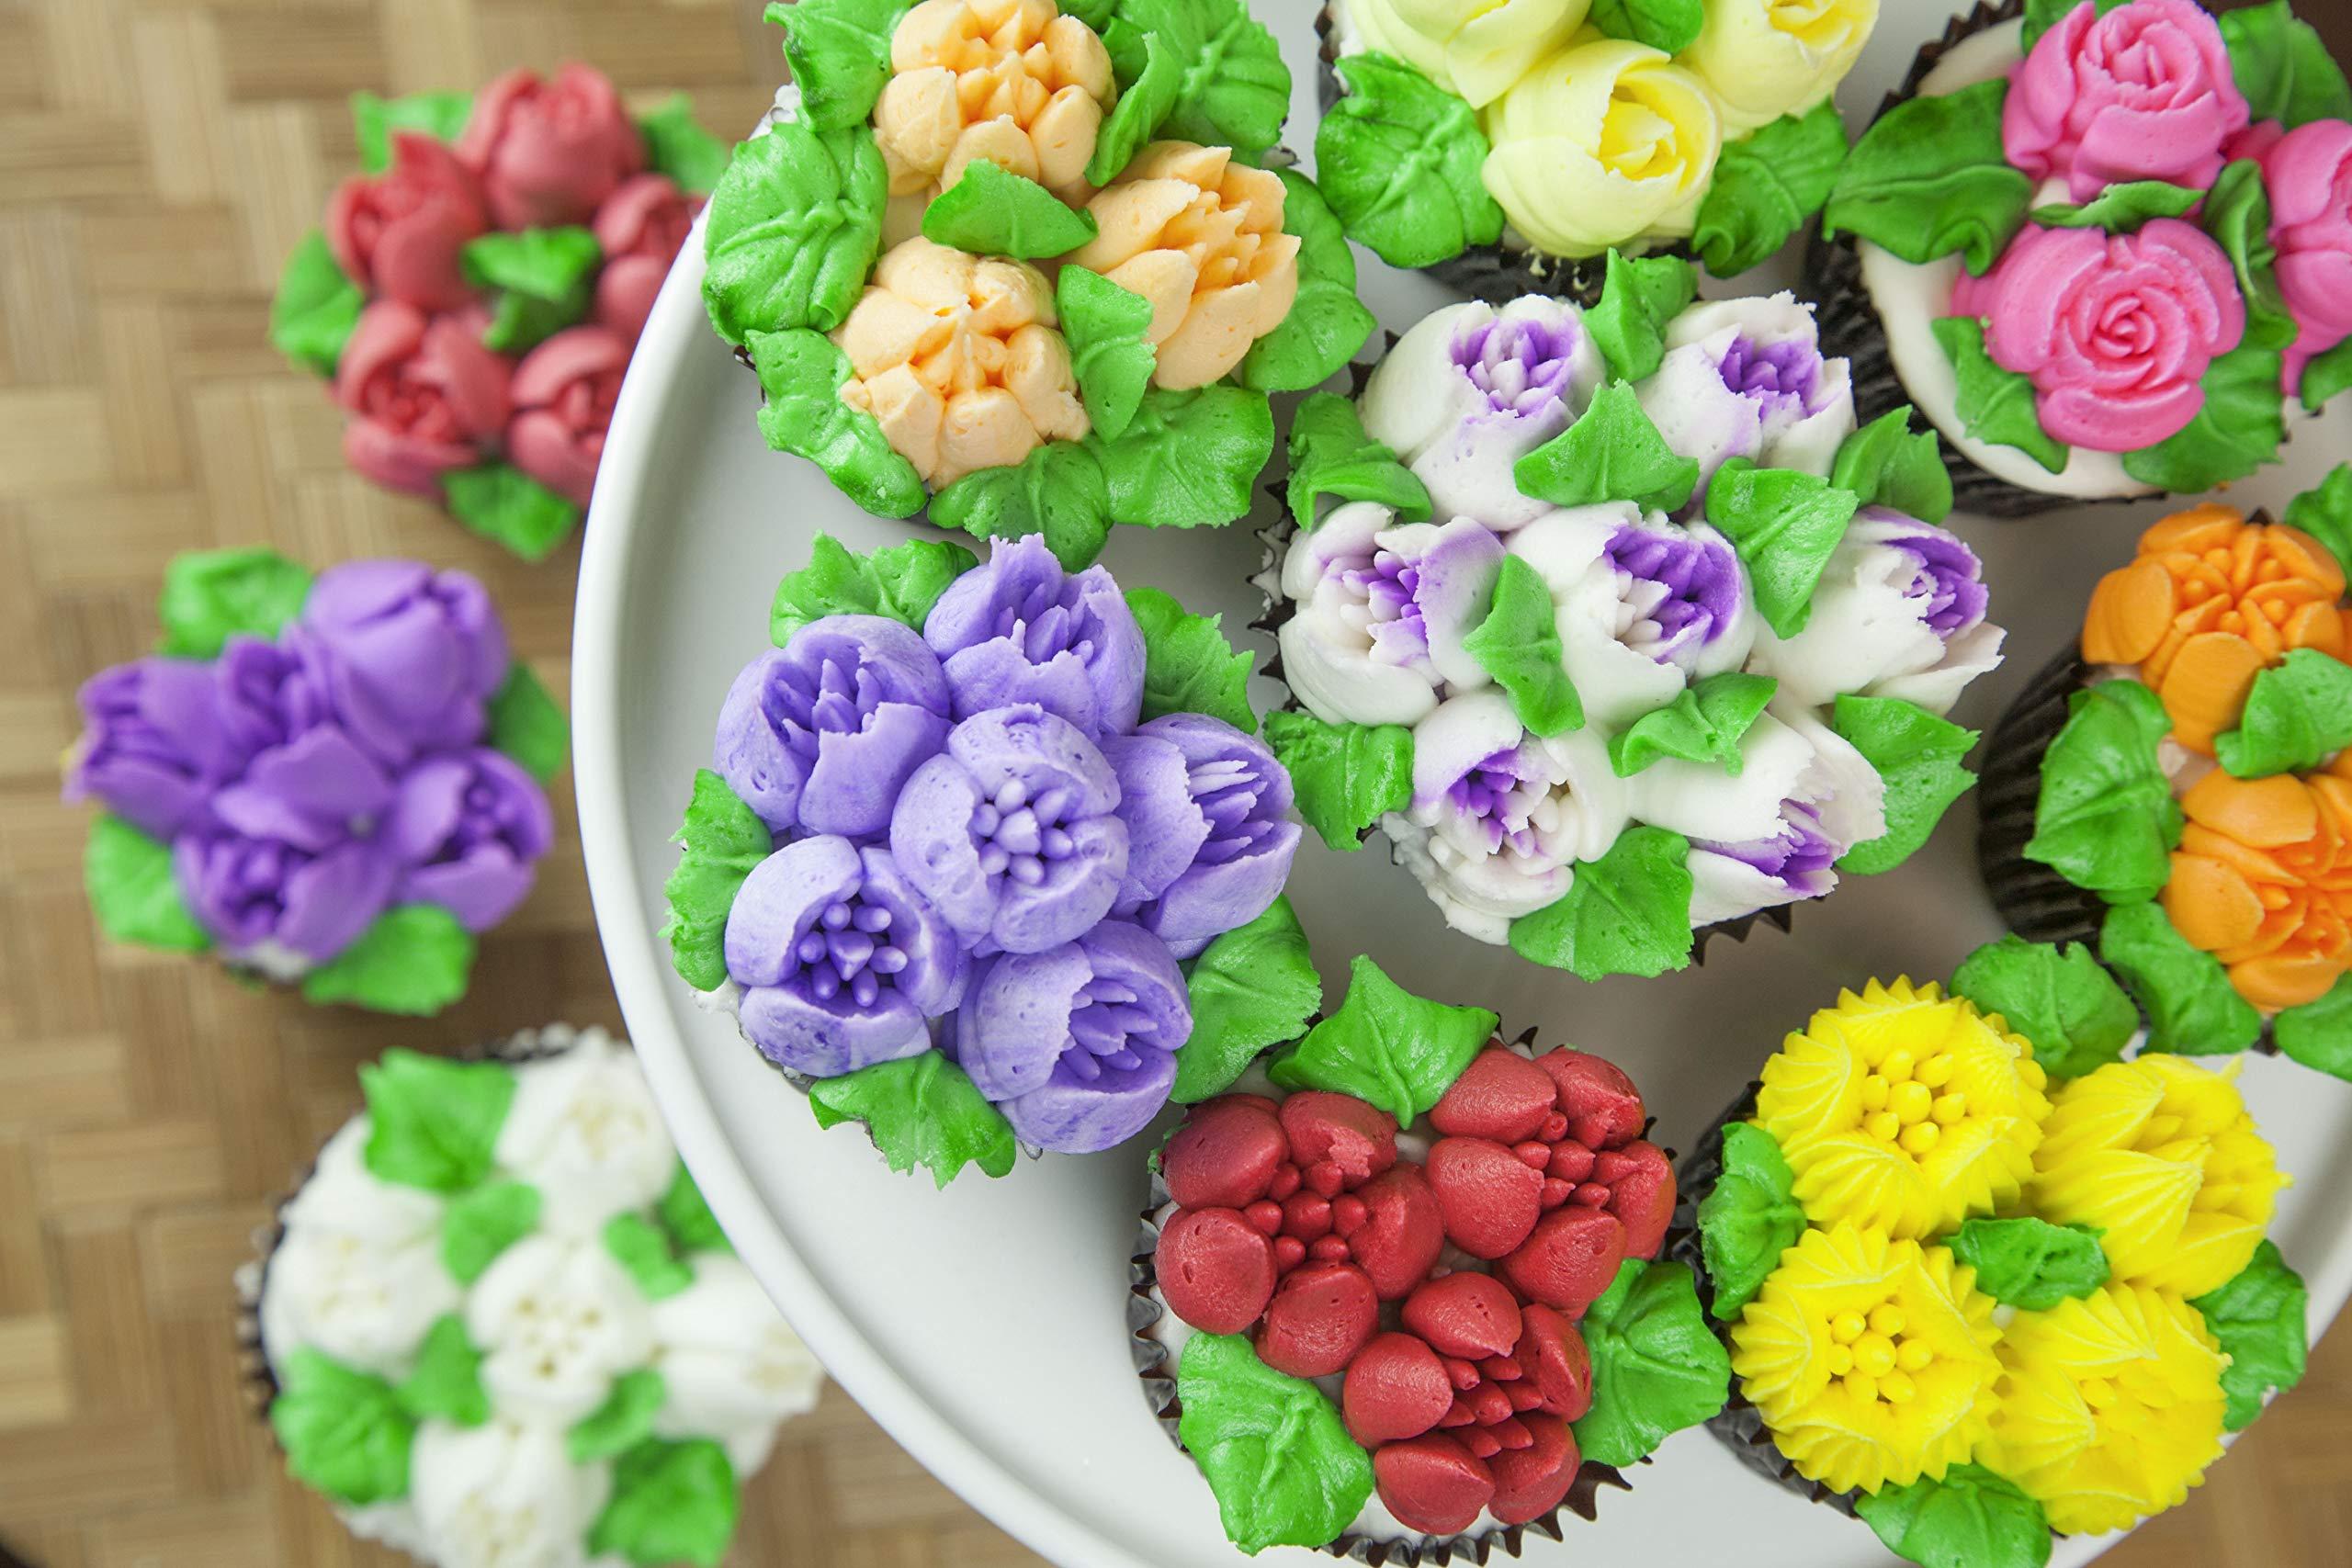 Global Sugar Art, Master Premium Food Coloring Gel Kit, Twenty Four Colors 3/4 Ounce by Chef Alan